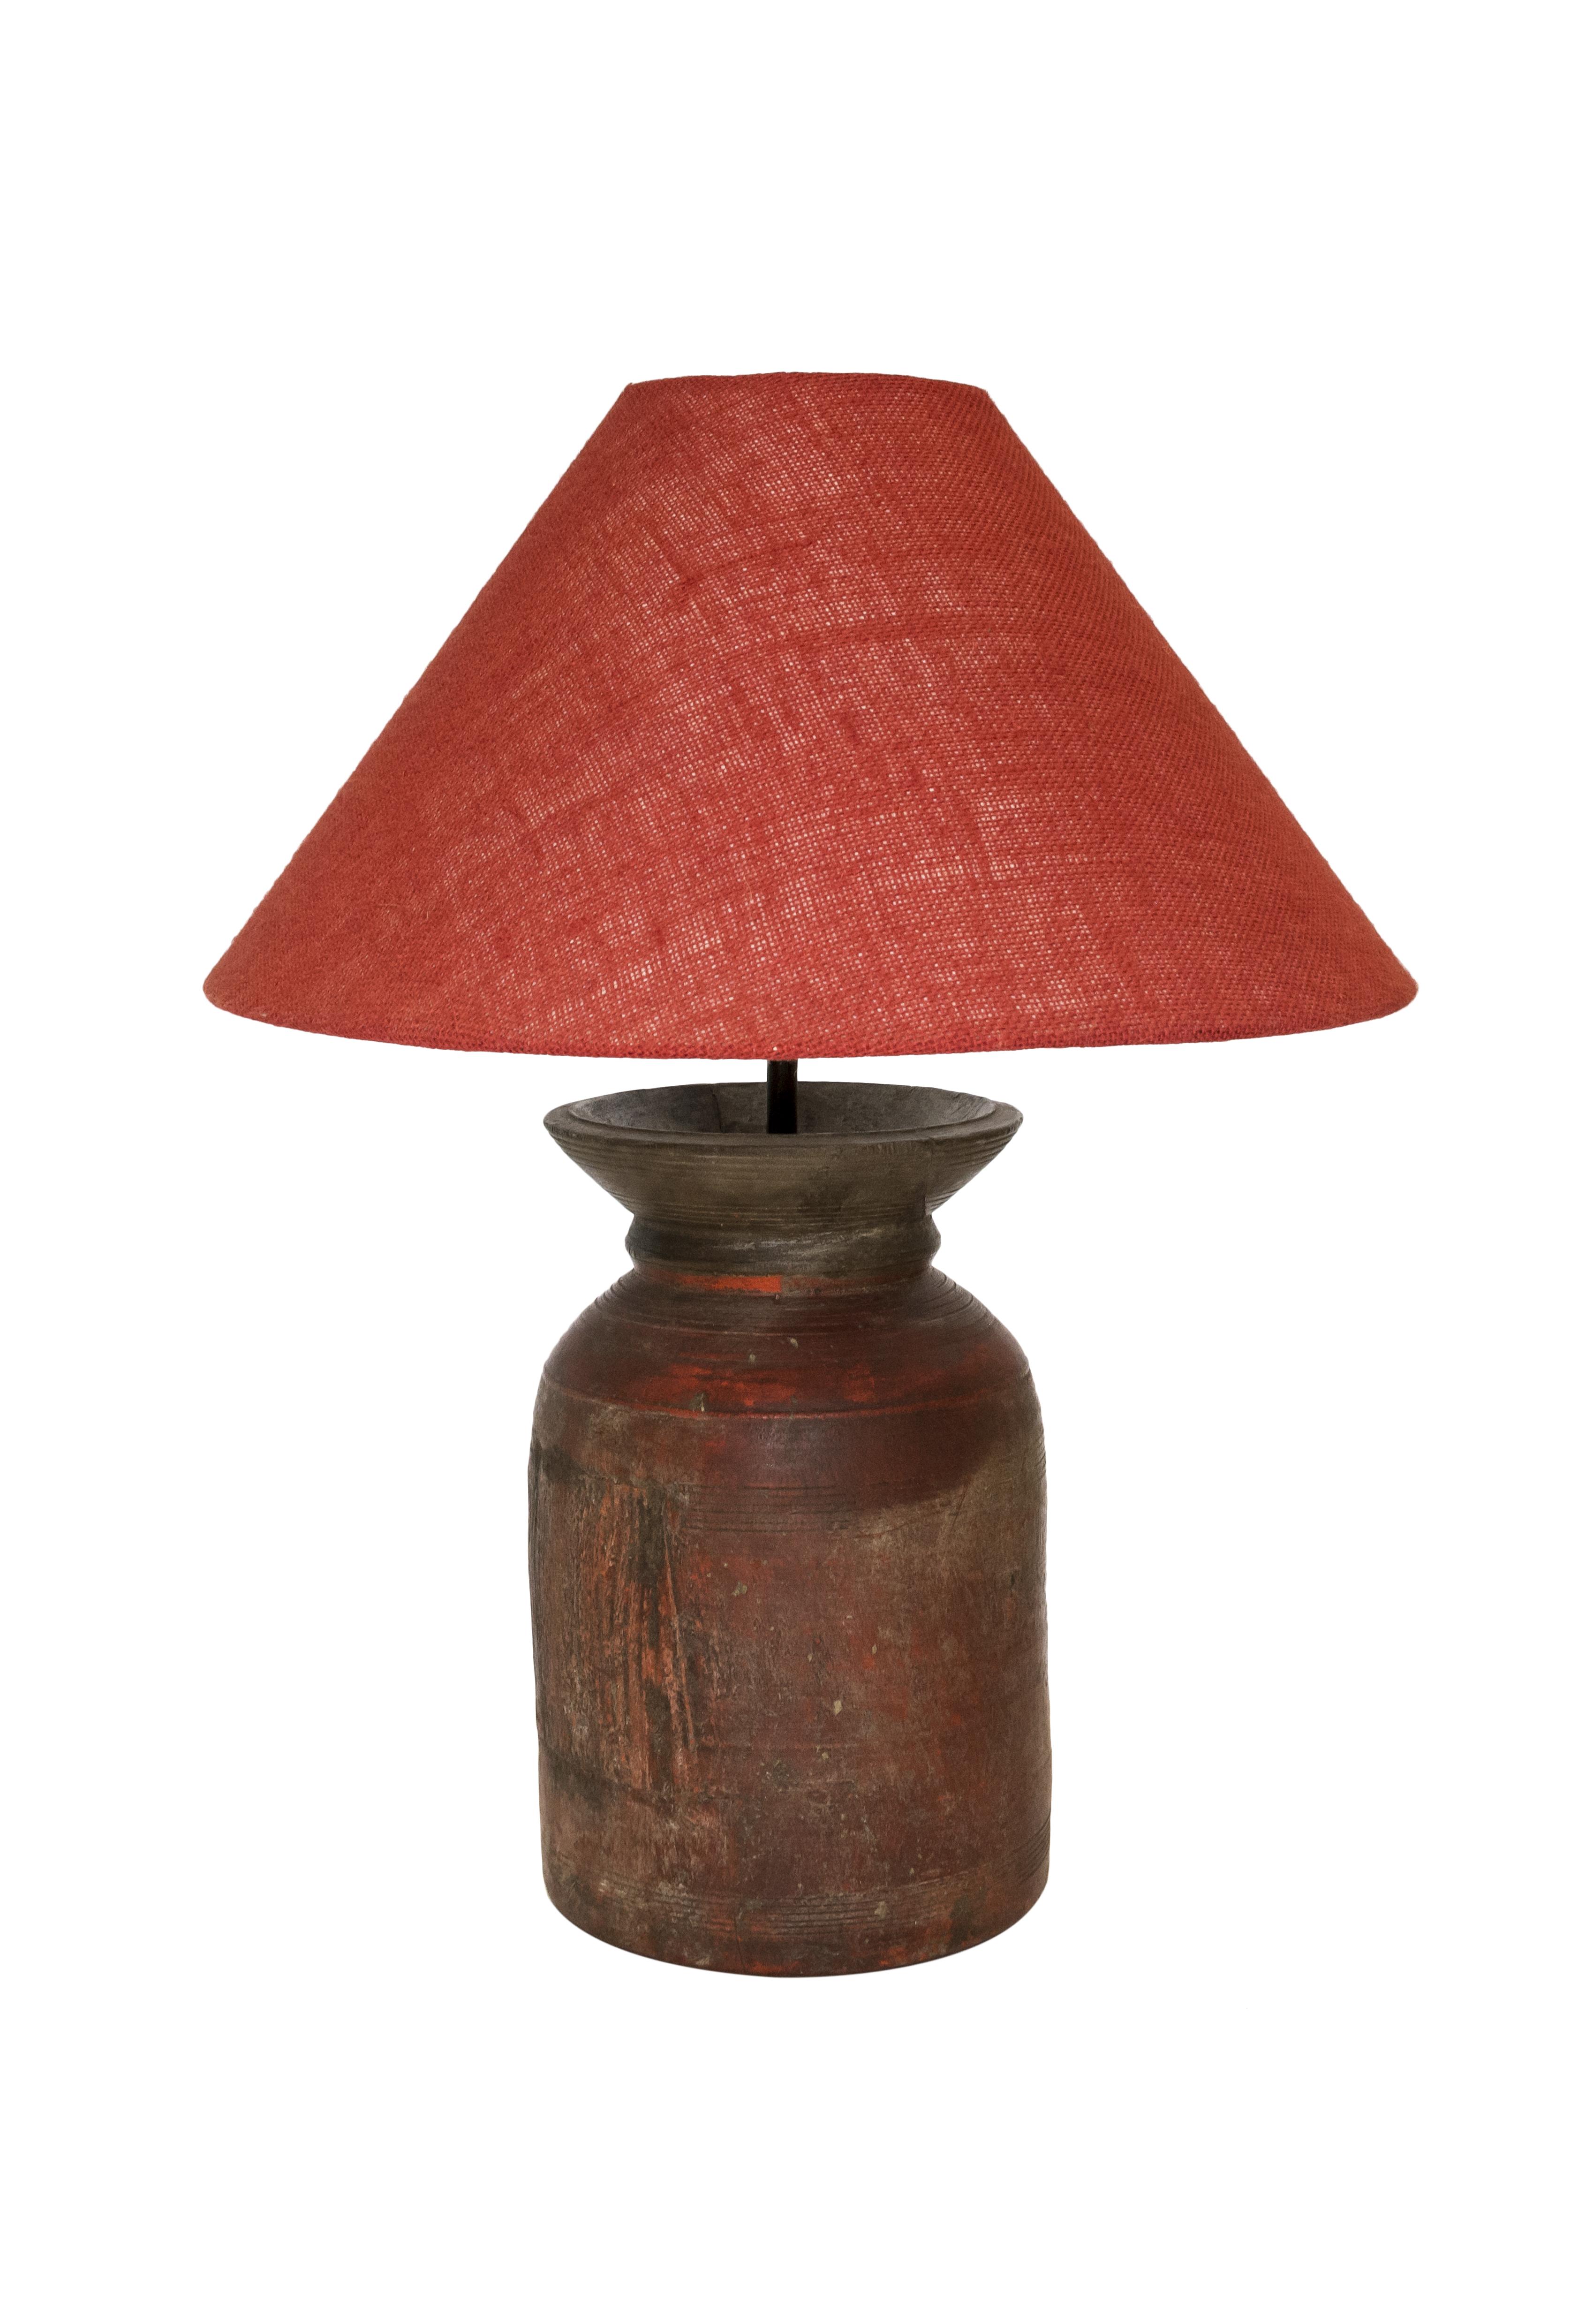 Tinaja table lamp, 30 Cm